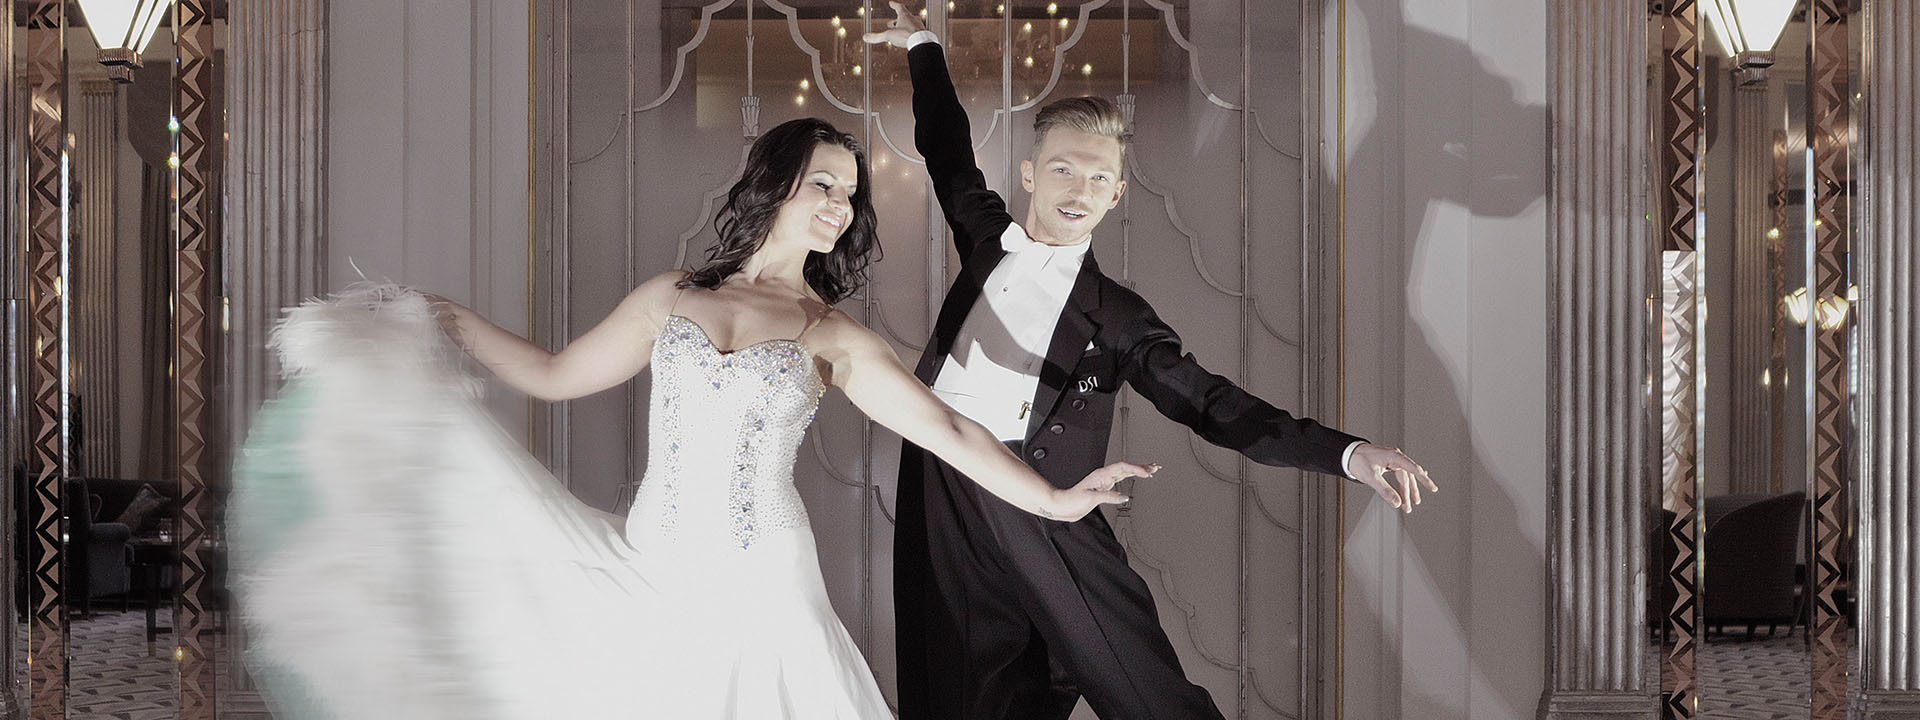 Bride and groom dancing at Claridge's